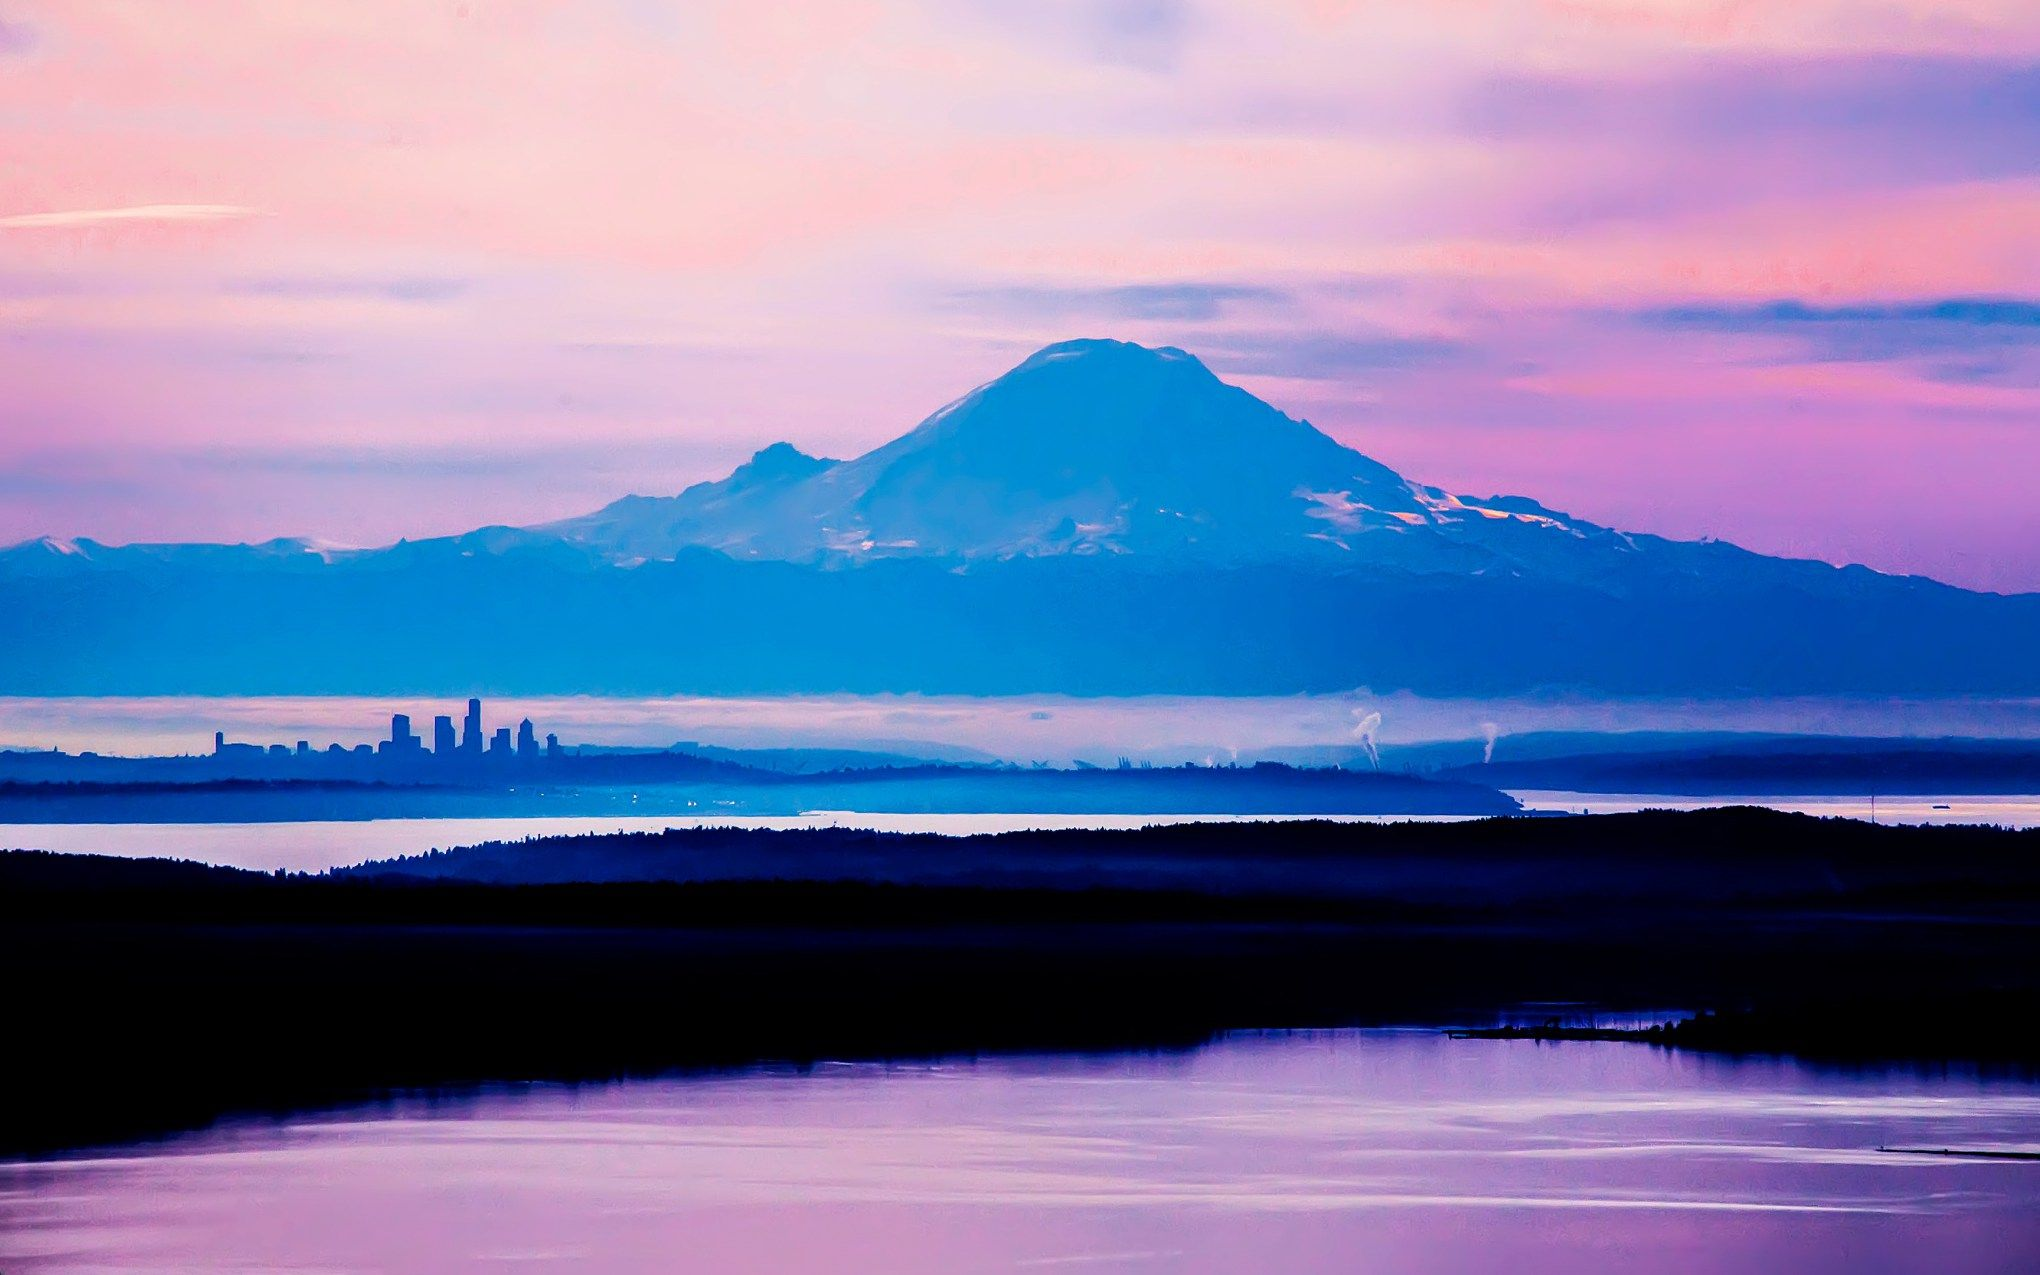 Landscape Background Image For Photo Editing Photoshop Landscape Background Cool Landscapes Mountain Lakes